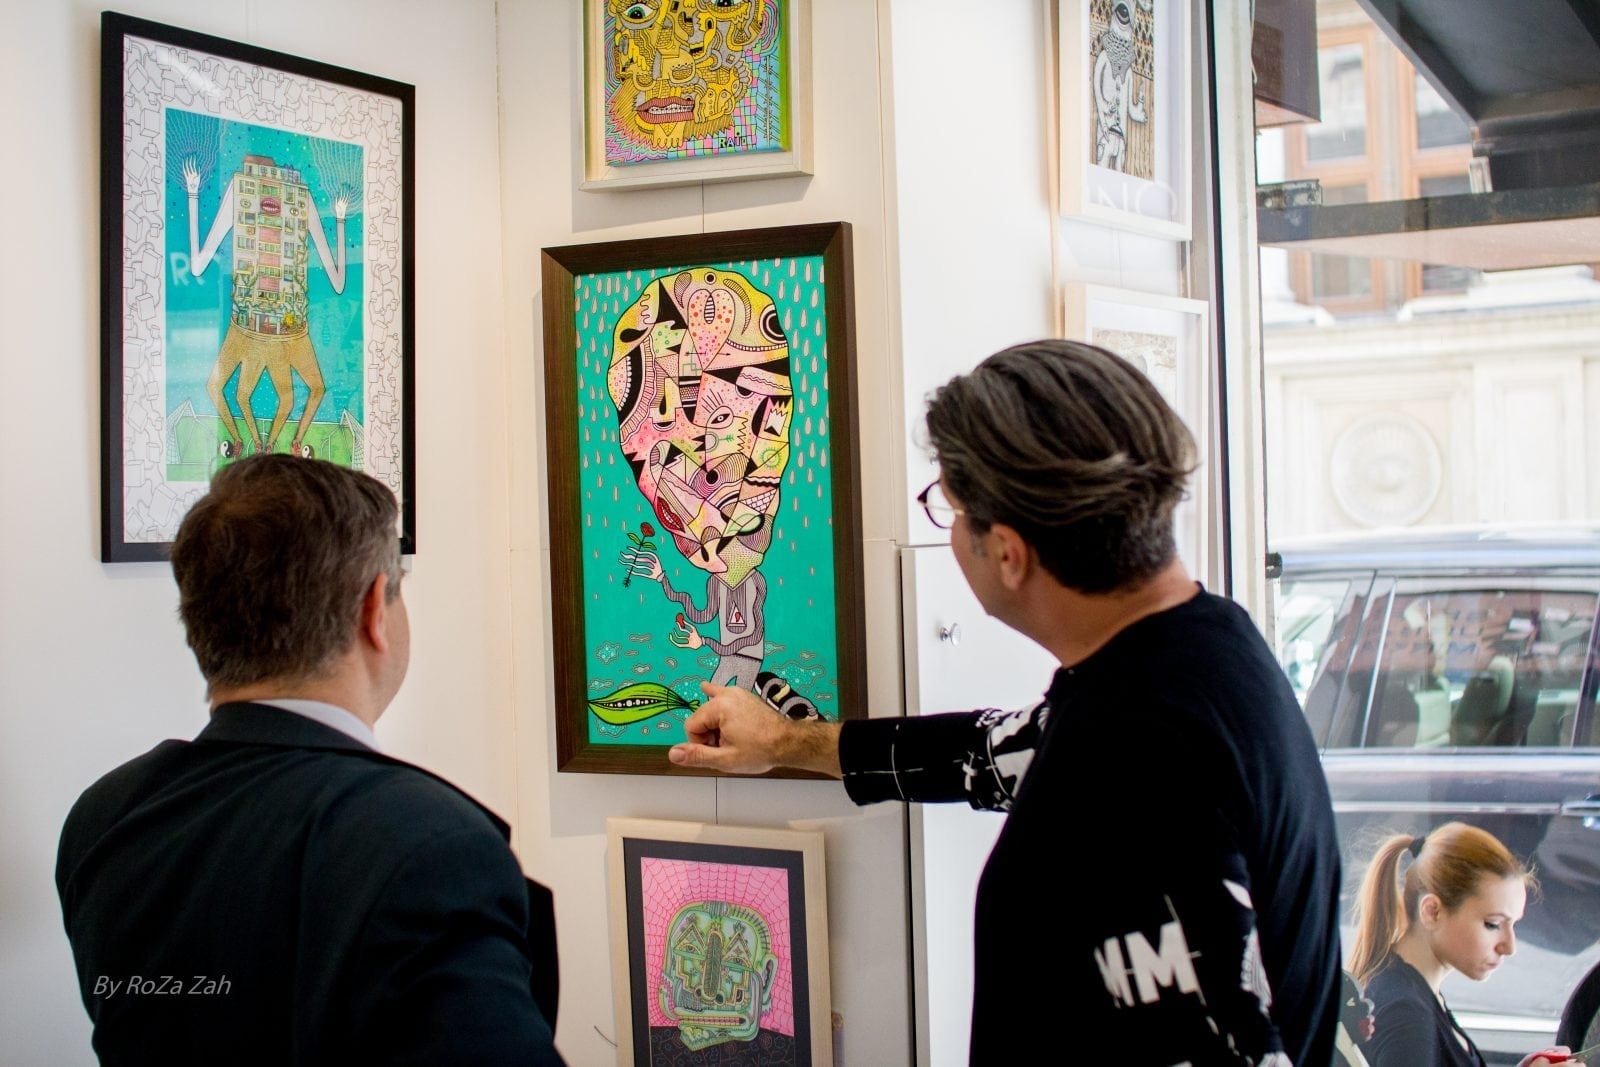 IMG 0392 - Galeria Rotenberg-Uzunov - Noua direcție: manifestul contemporaneității